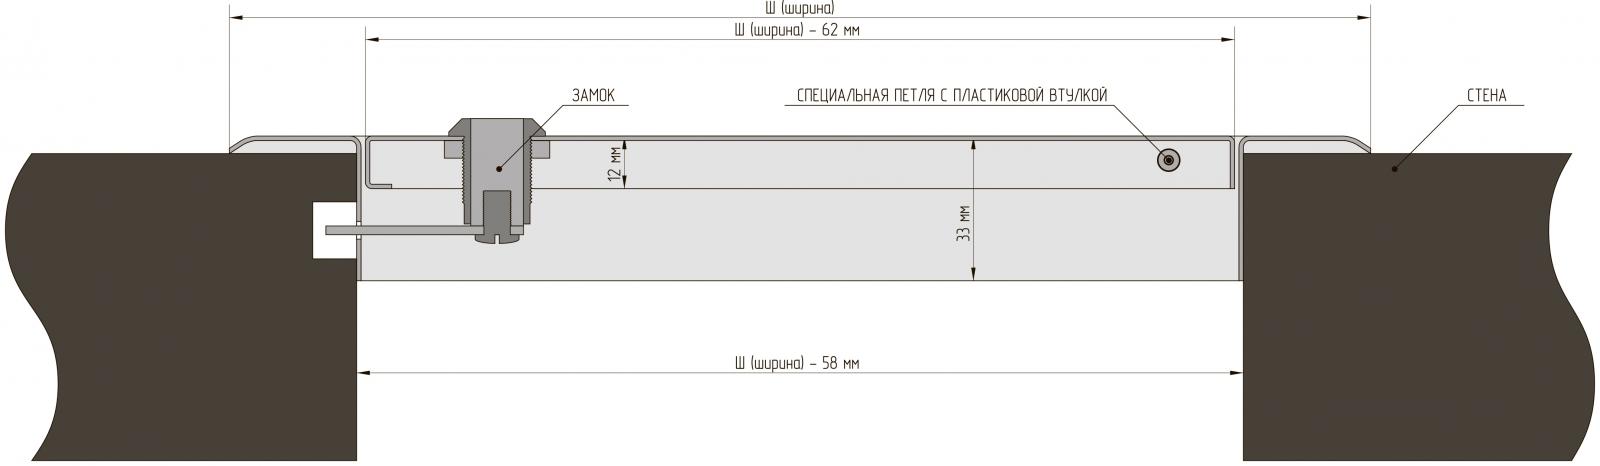 Металлическая люк-дверца с замком (Алкрафт) схема установки